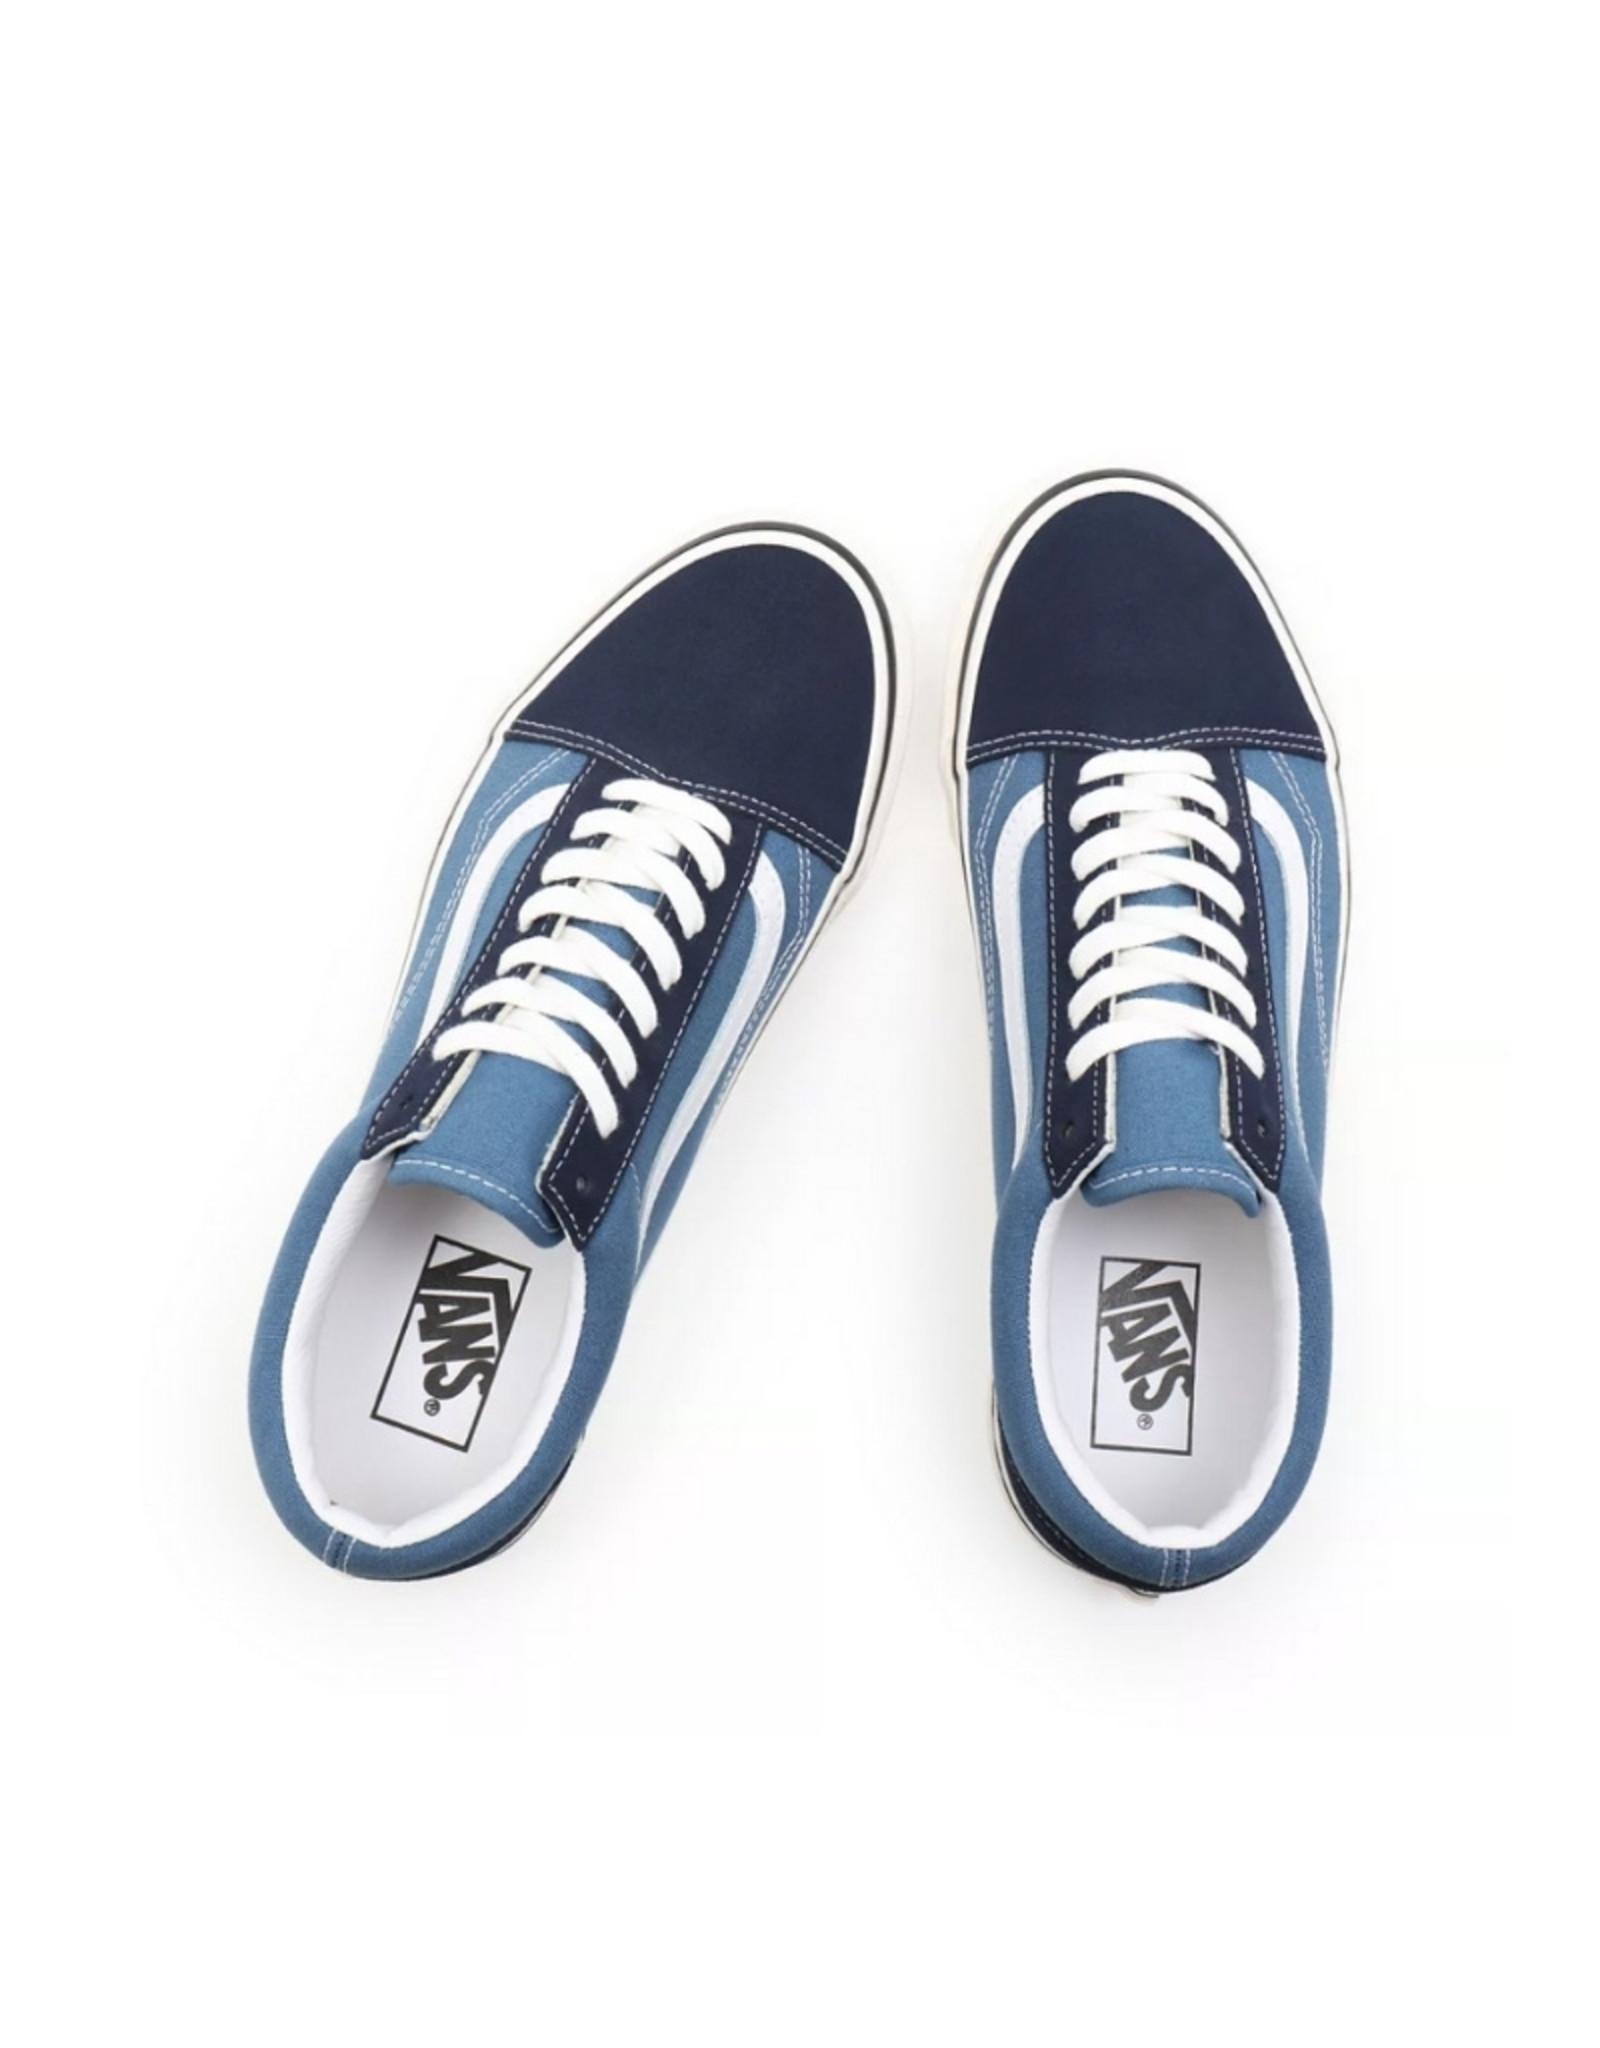 Vans - Old Skool 36 Dx - VN0A38G2PXC1